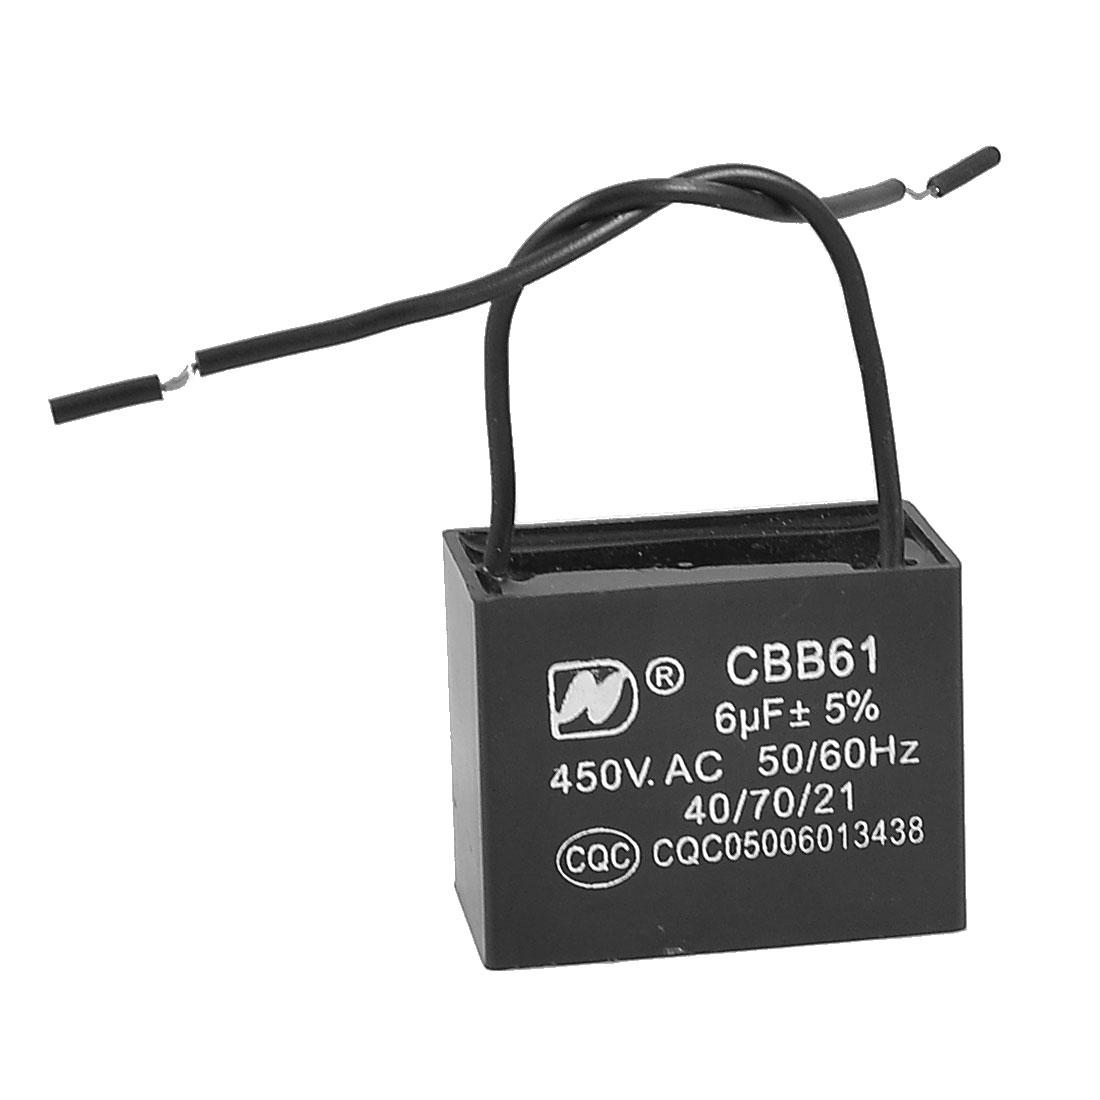 CBB61 Metalized Polypropylene Film Motor Run Capacitor AC 450V 6uF